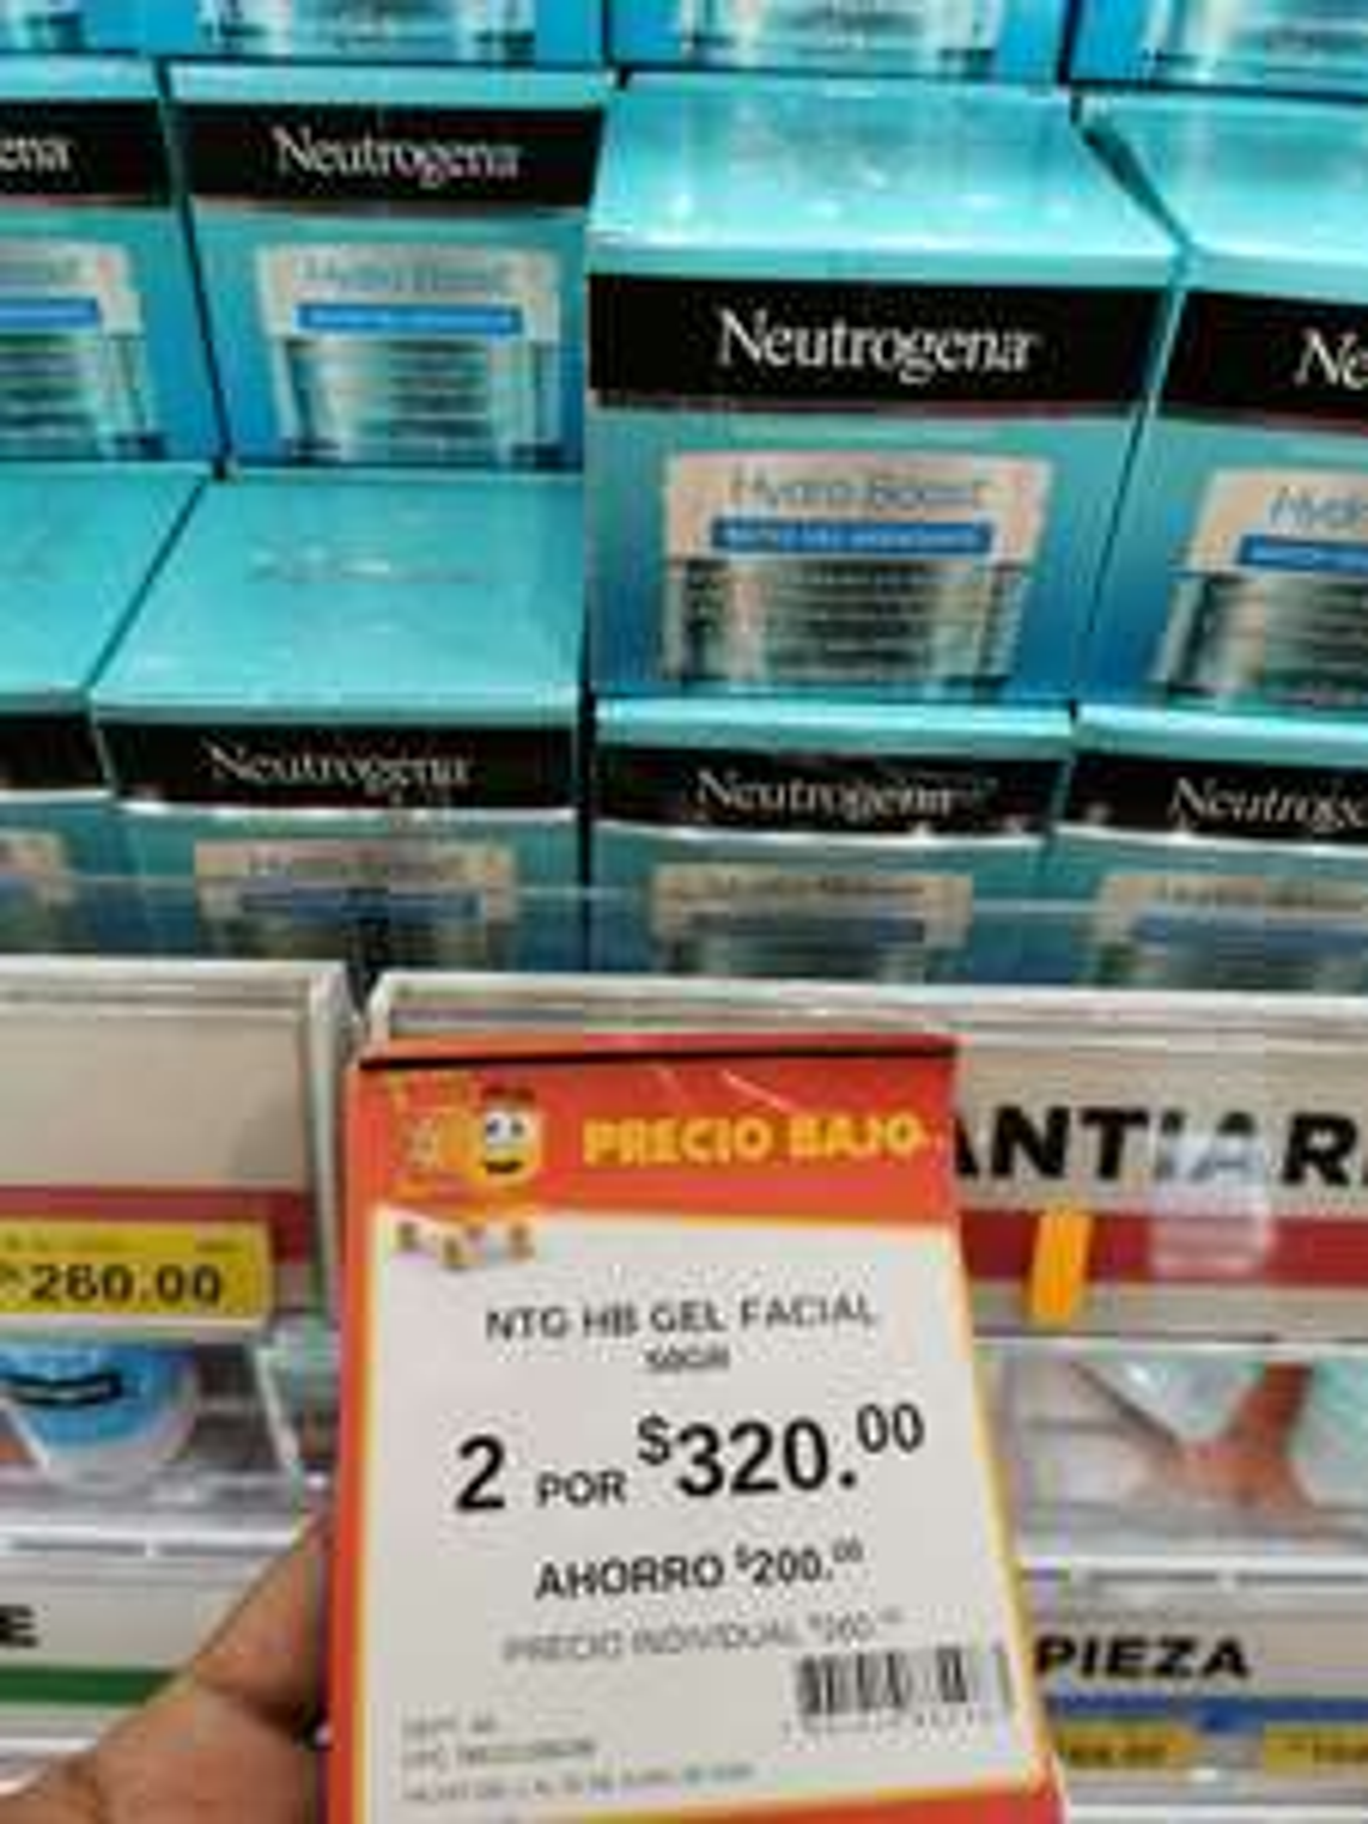 Walmart: 2X1 Gel Facial Neutrogena Hydro Boost